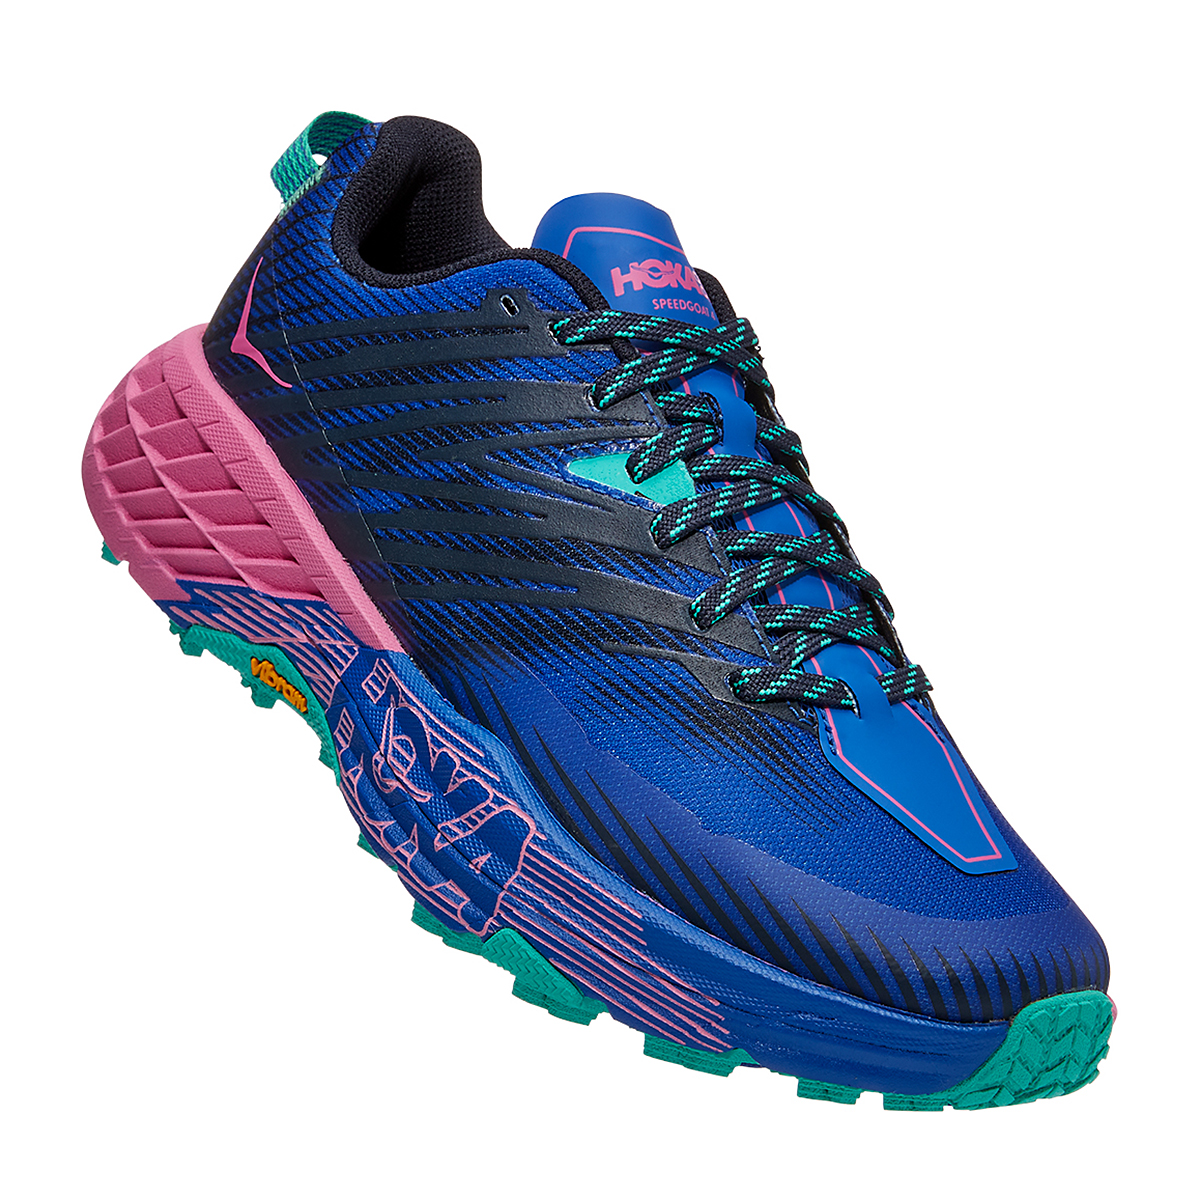 Women's Hoka One One Speedgoat 4 Trail Running Shoe - Color: Dazzling Blue/Phlox Pink - Size: 6 - Width: Regular, Dazzling Blue/Phlox Pink, large, image 2